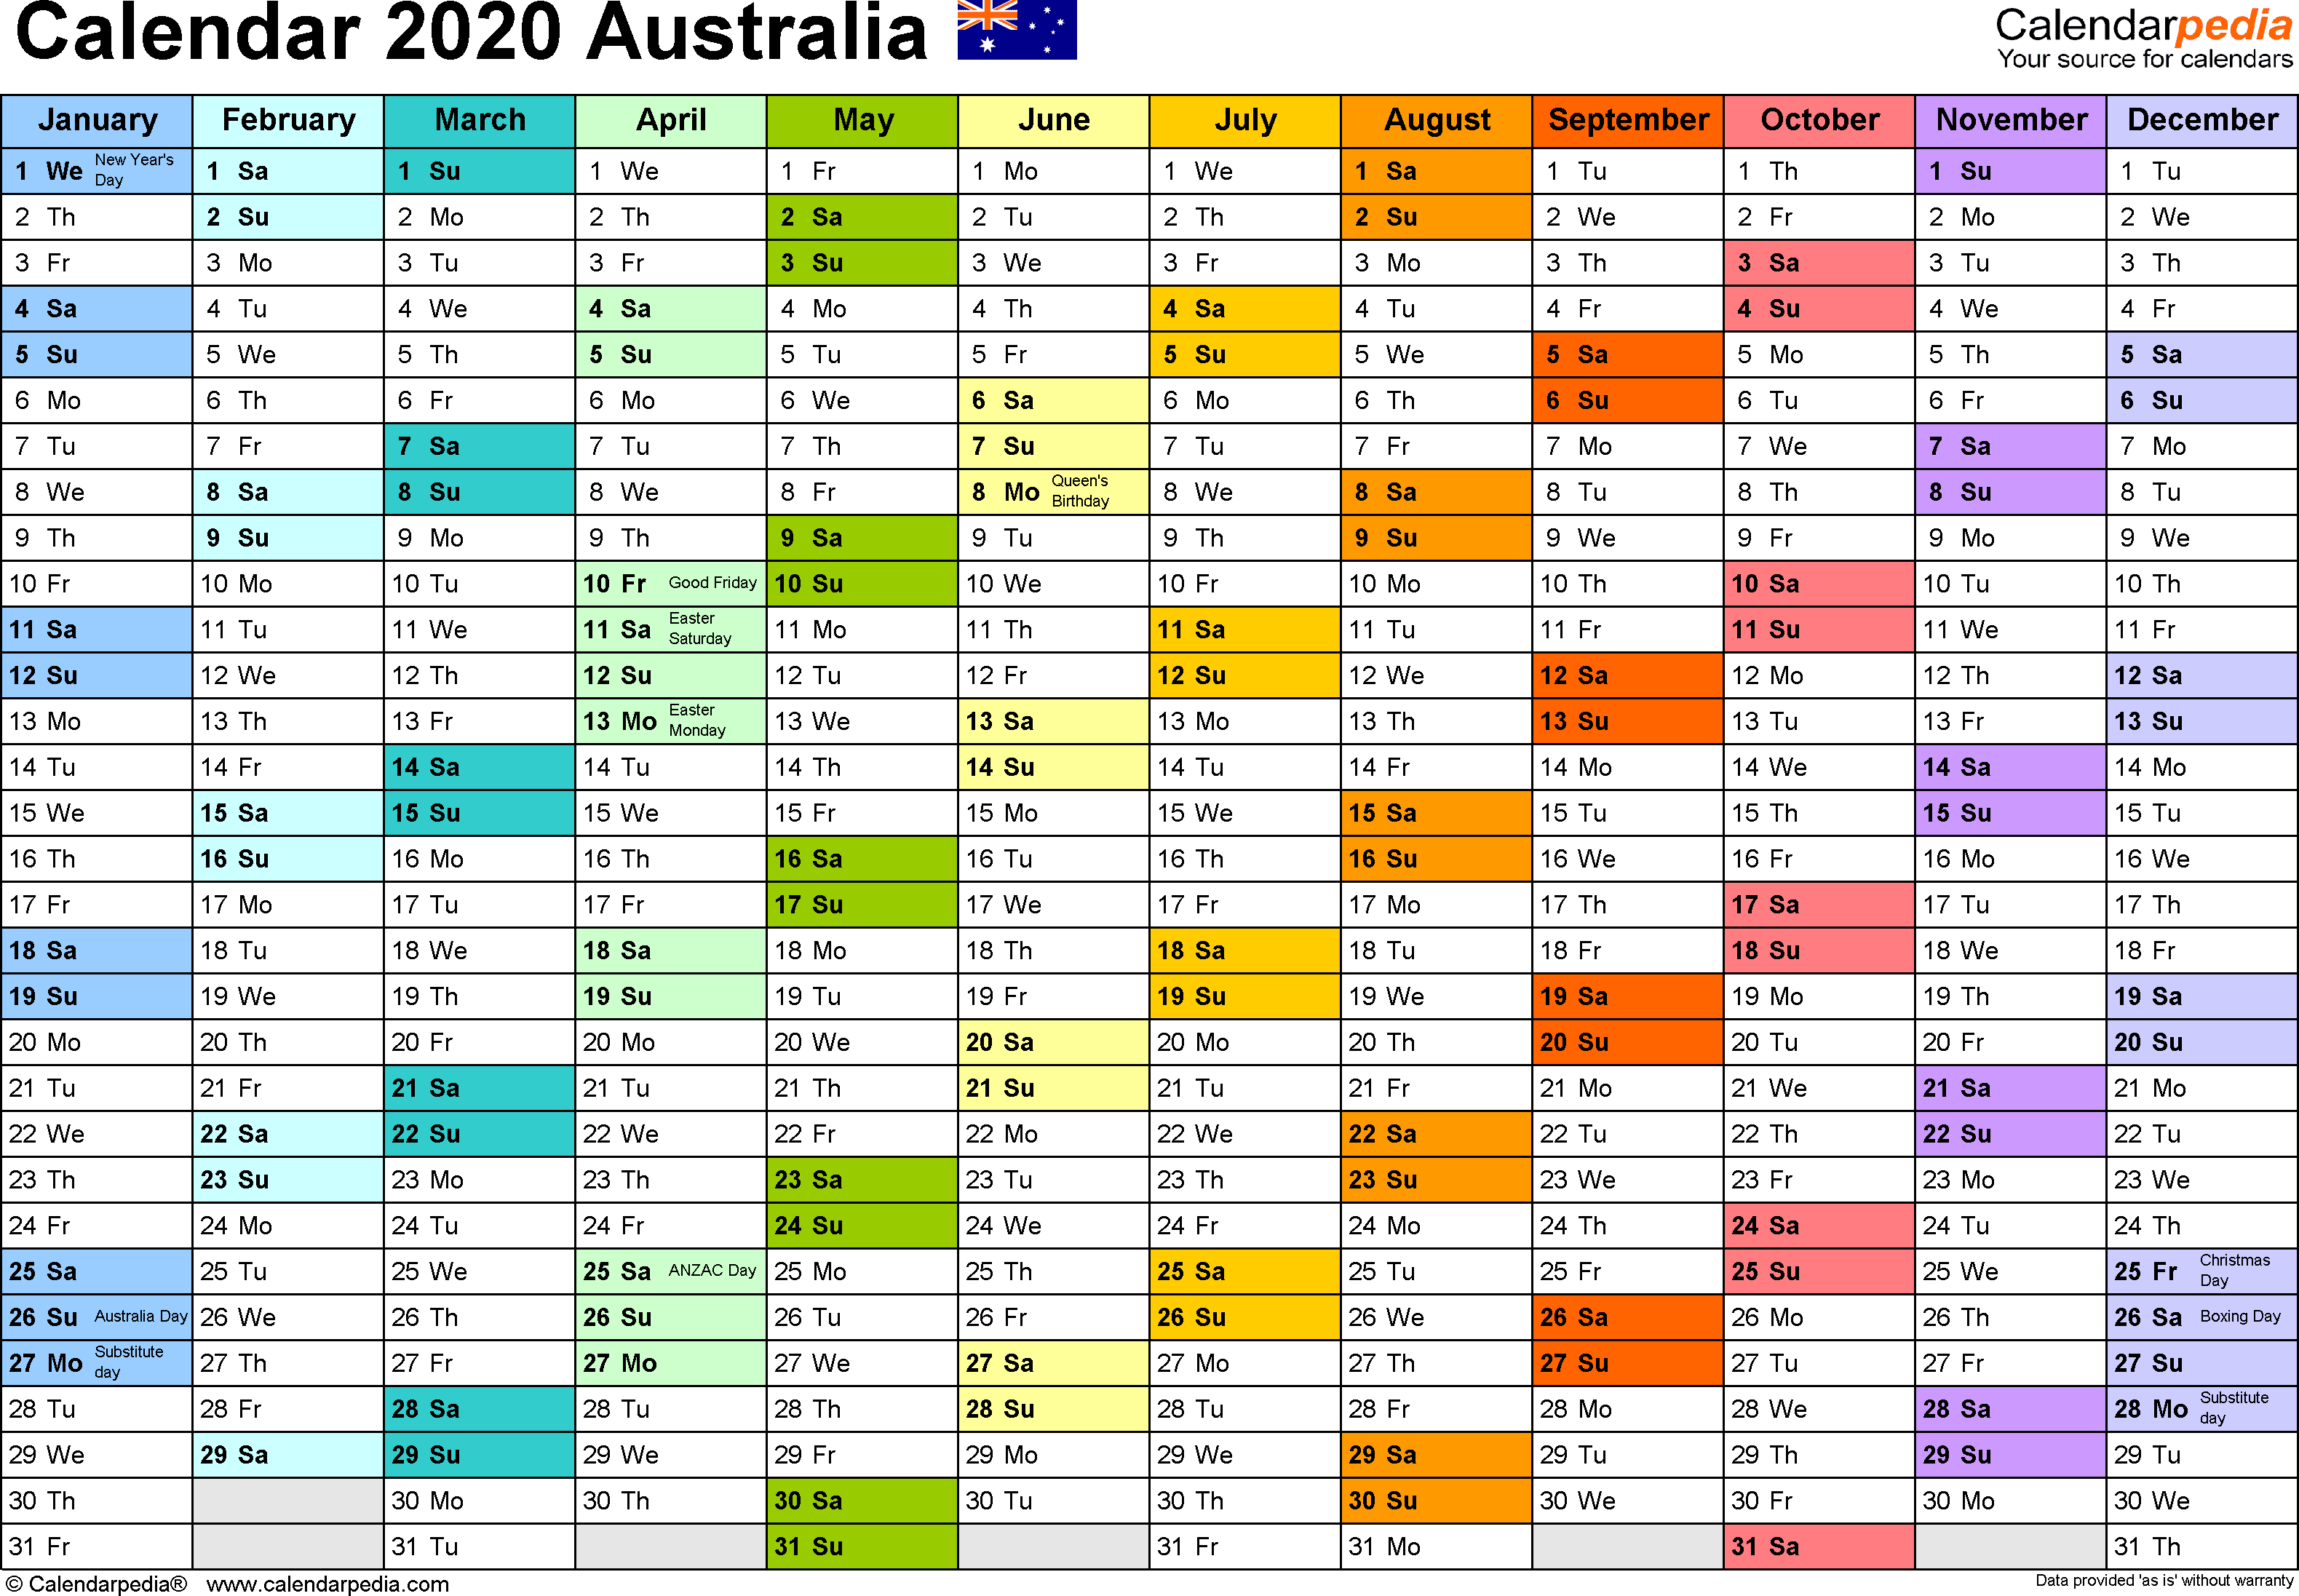 Australia Calendar 2020 - Free Printable Pdf Templates pertaining to 2020 Calendar Australian